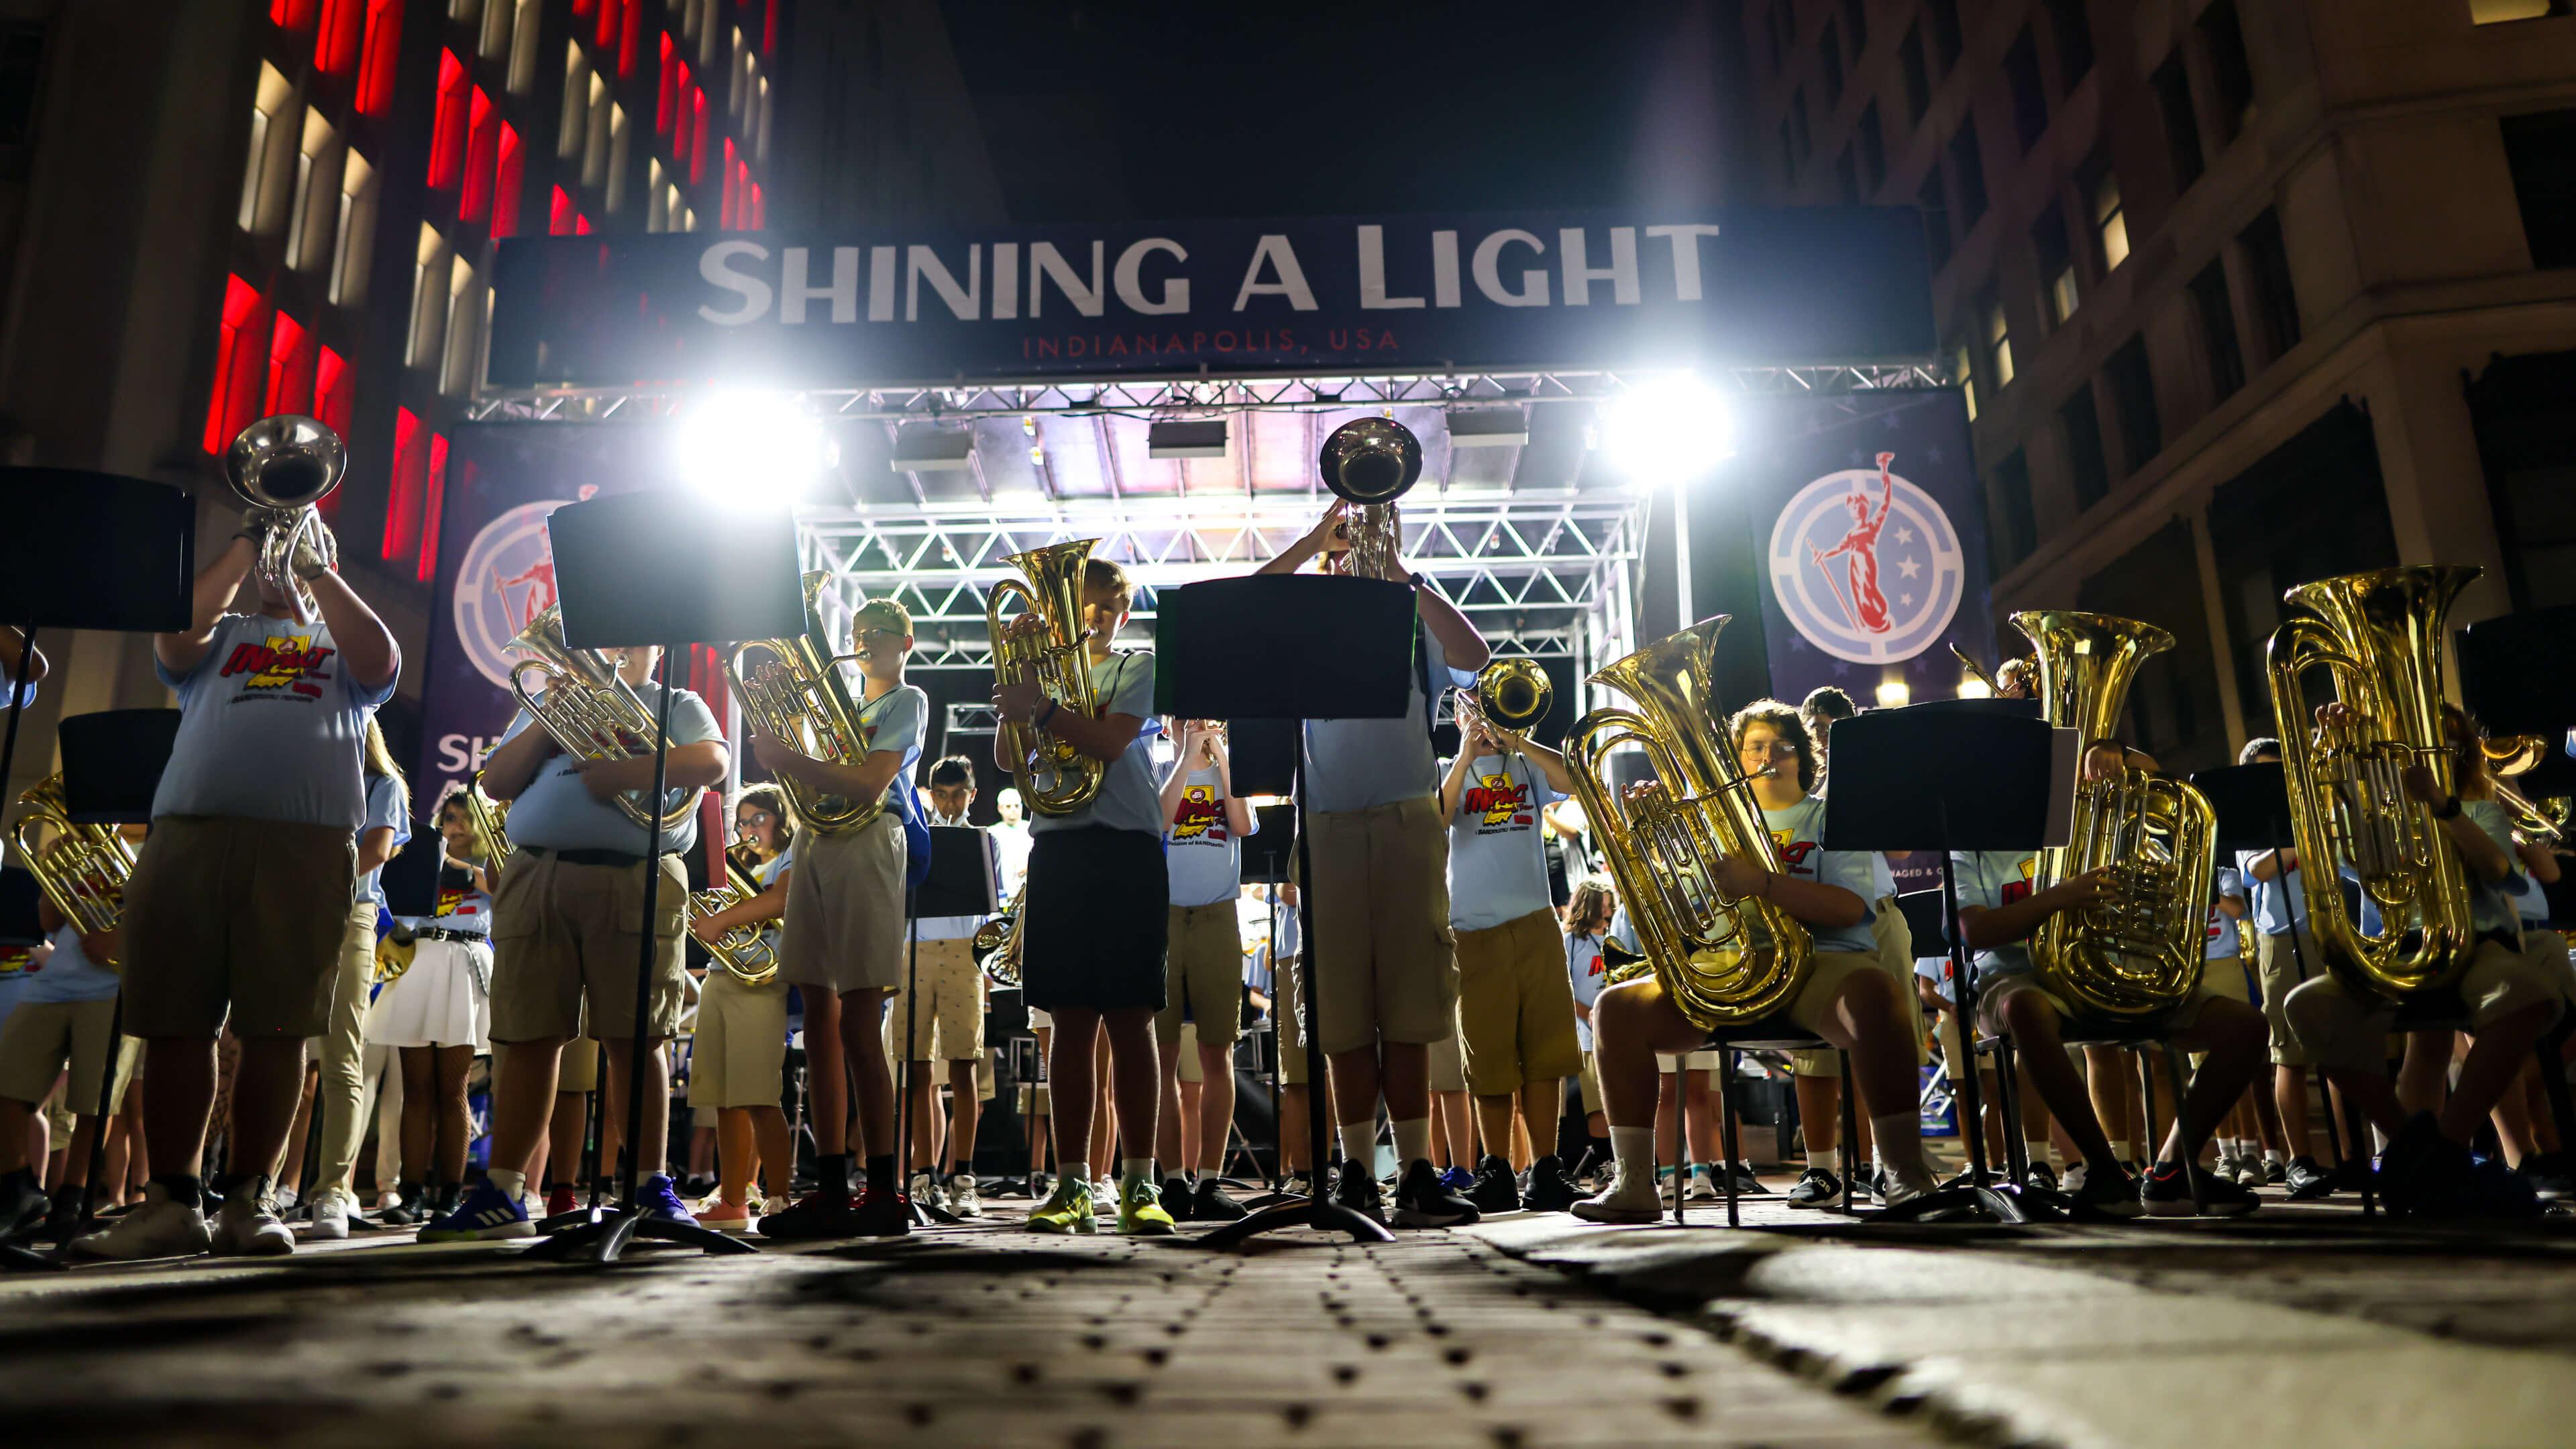 2021 Shining A Light on Music Education